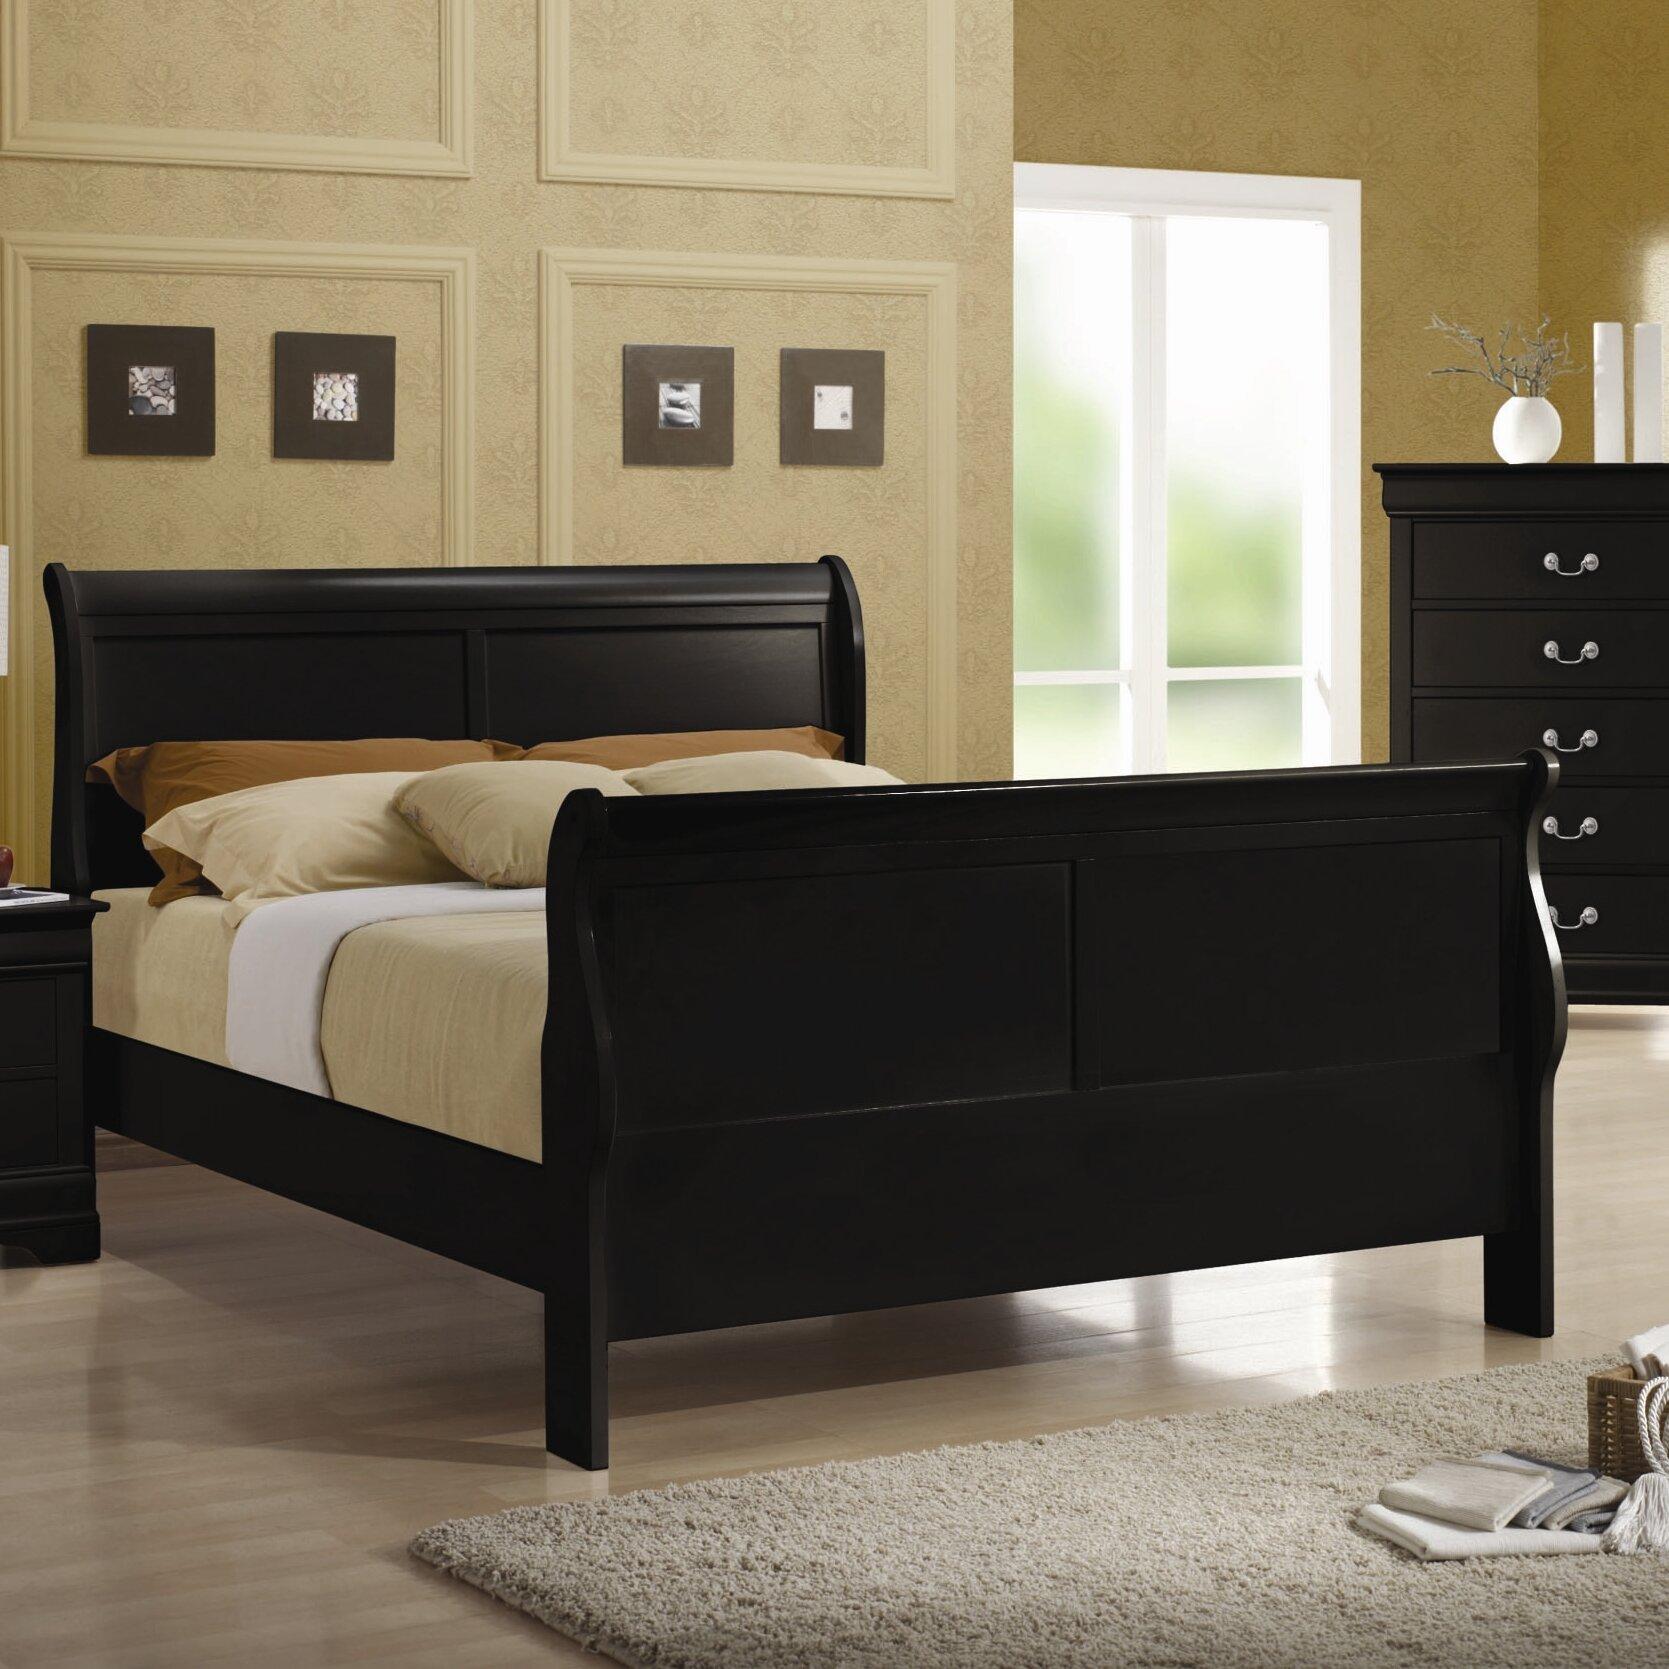 Alcott hill northampton sleigh bed reviews wayfair for Furniture northampton